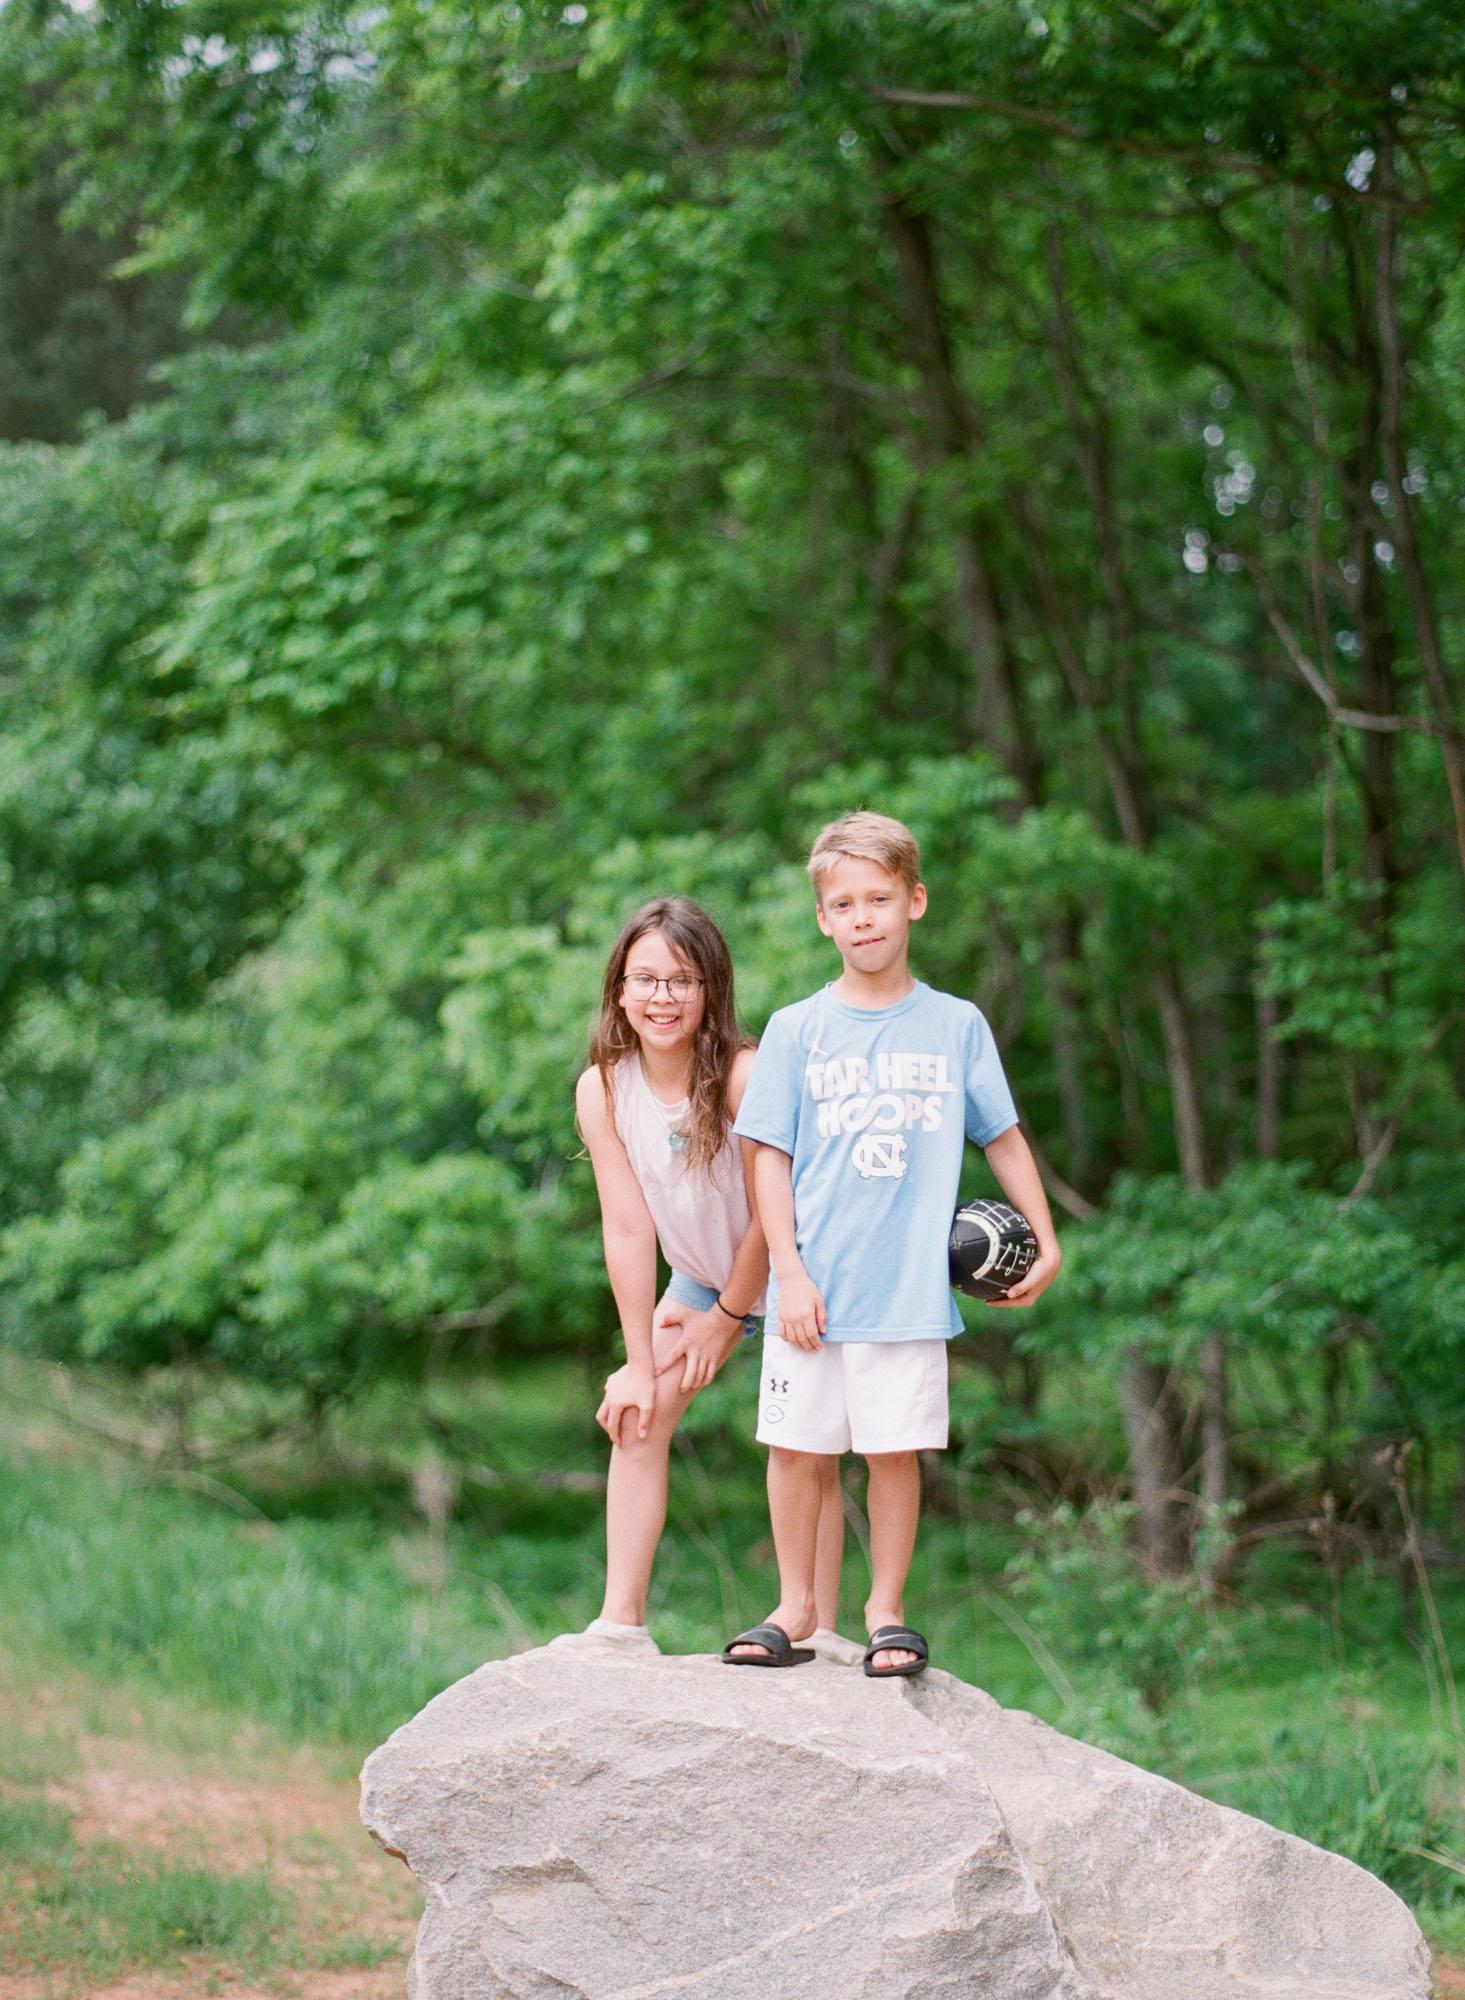 raleigh-family-photographer-studio-milestone-baby-photography-003